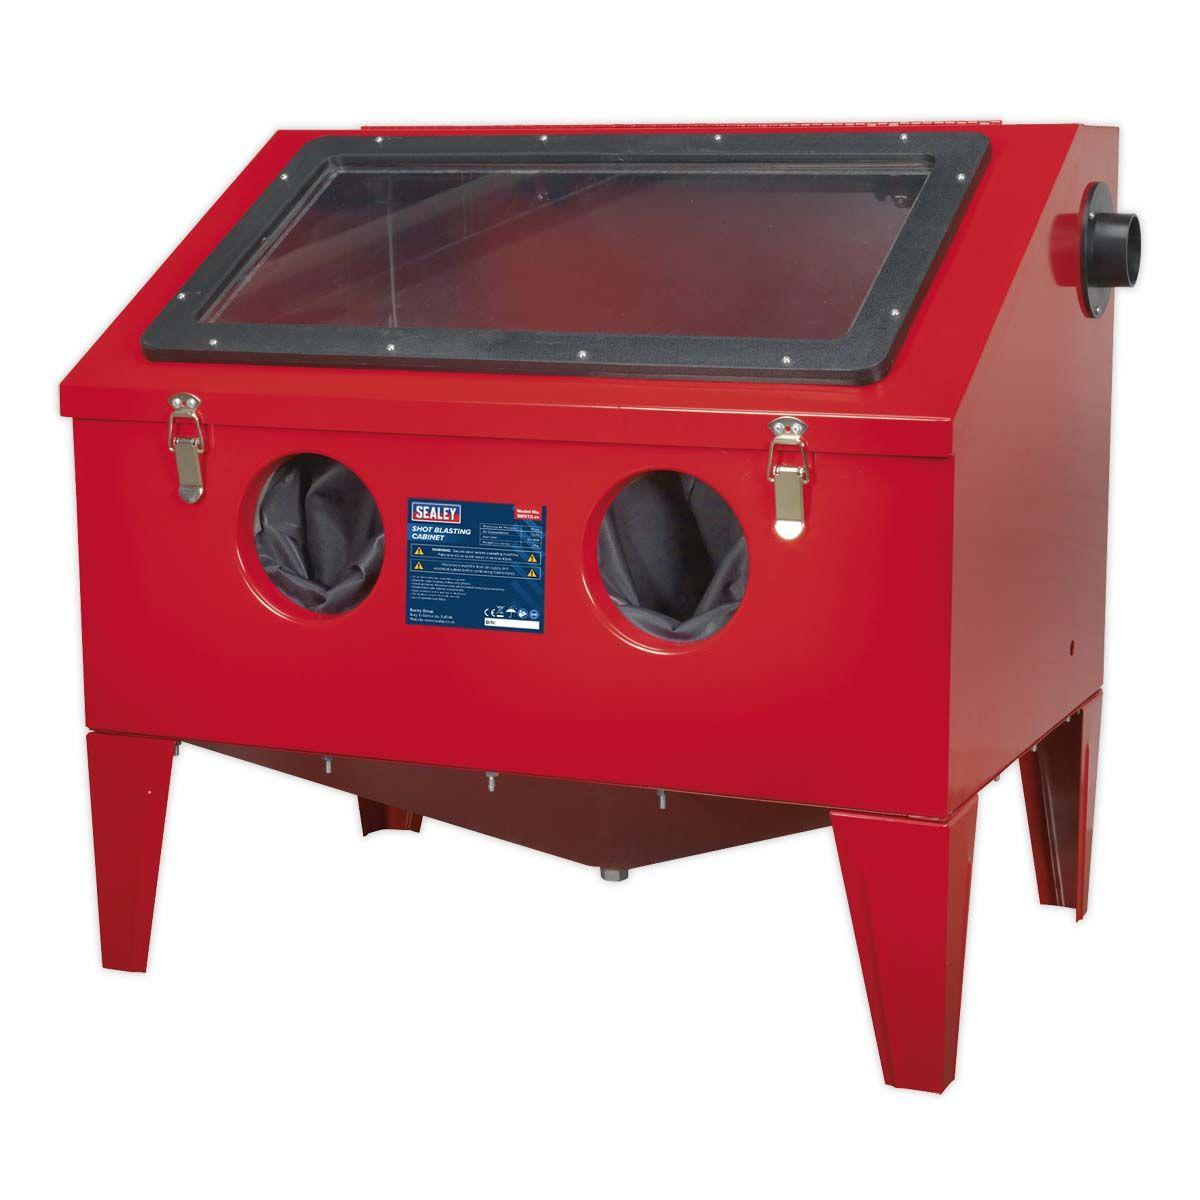 Sealey Shot Blasting Cabinet 760 x 510 x 715mm